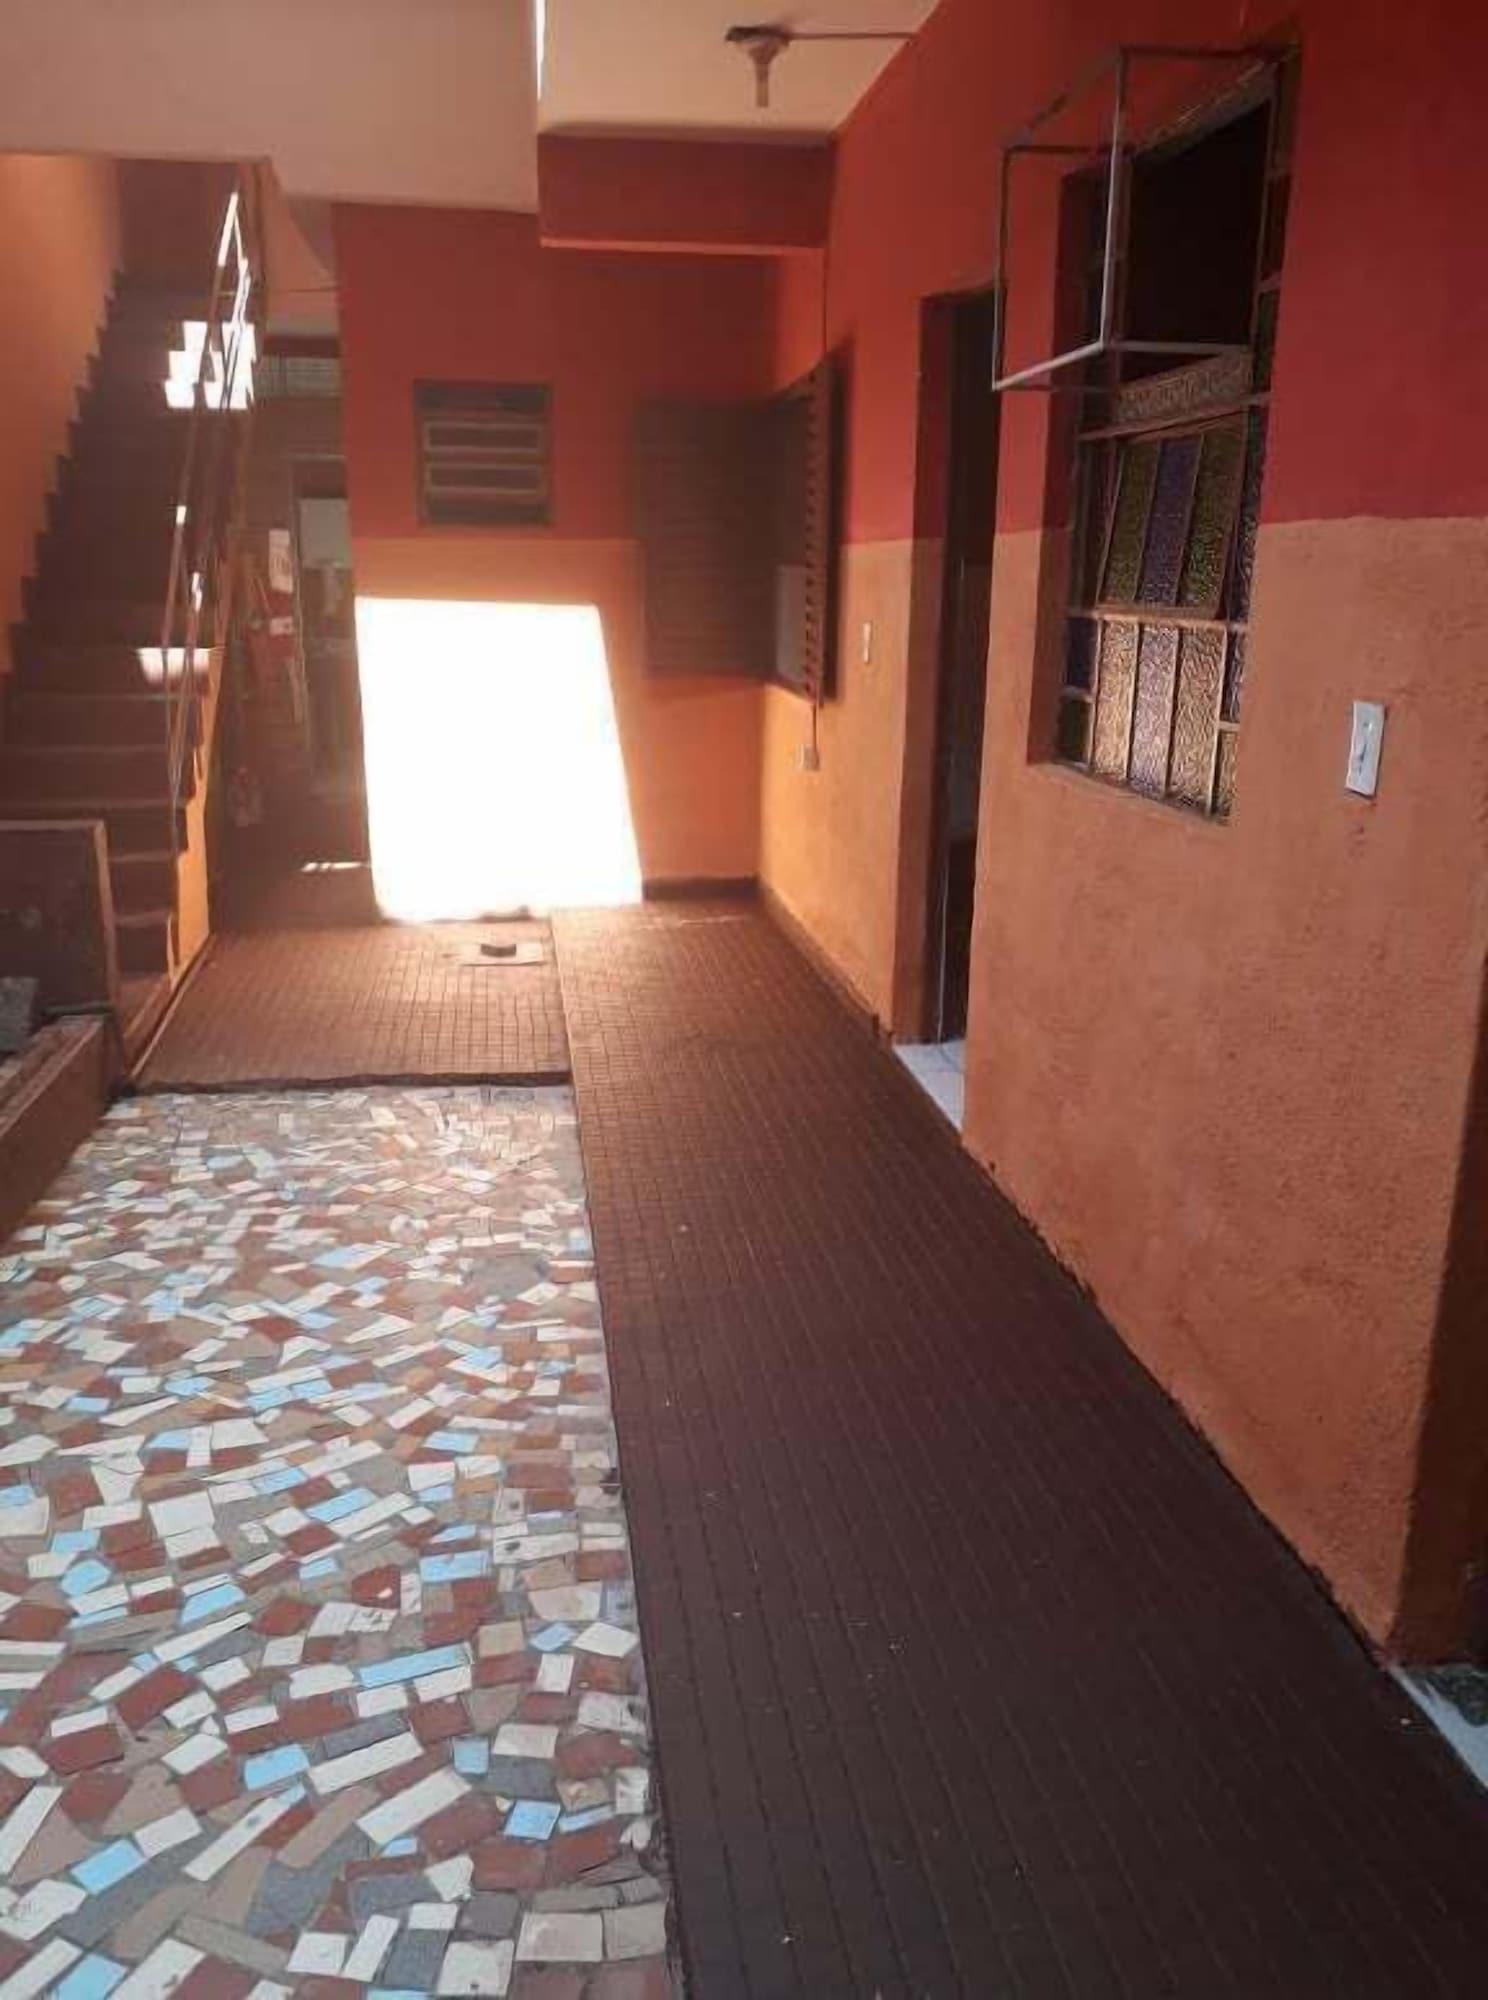 Pousada & Hostel Casa Sefarad, Fortaleza